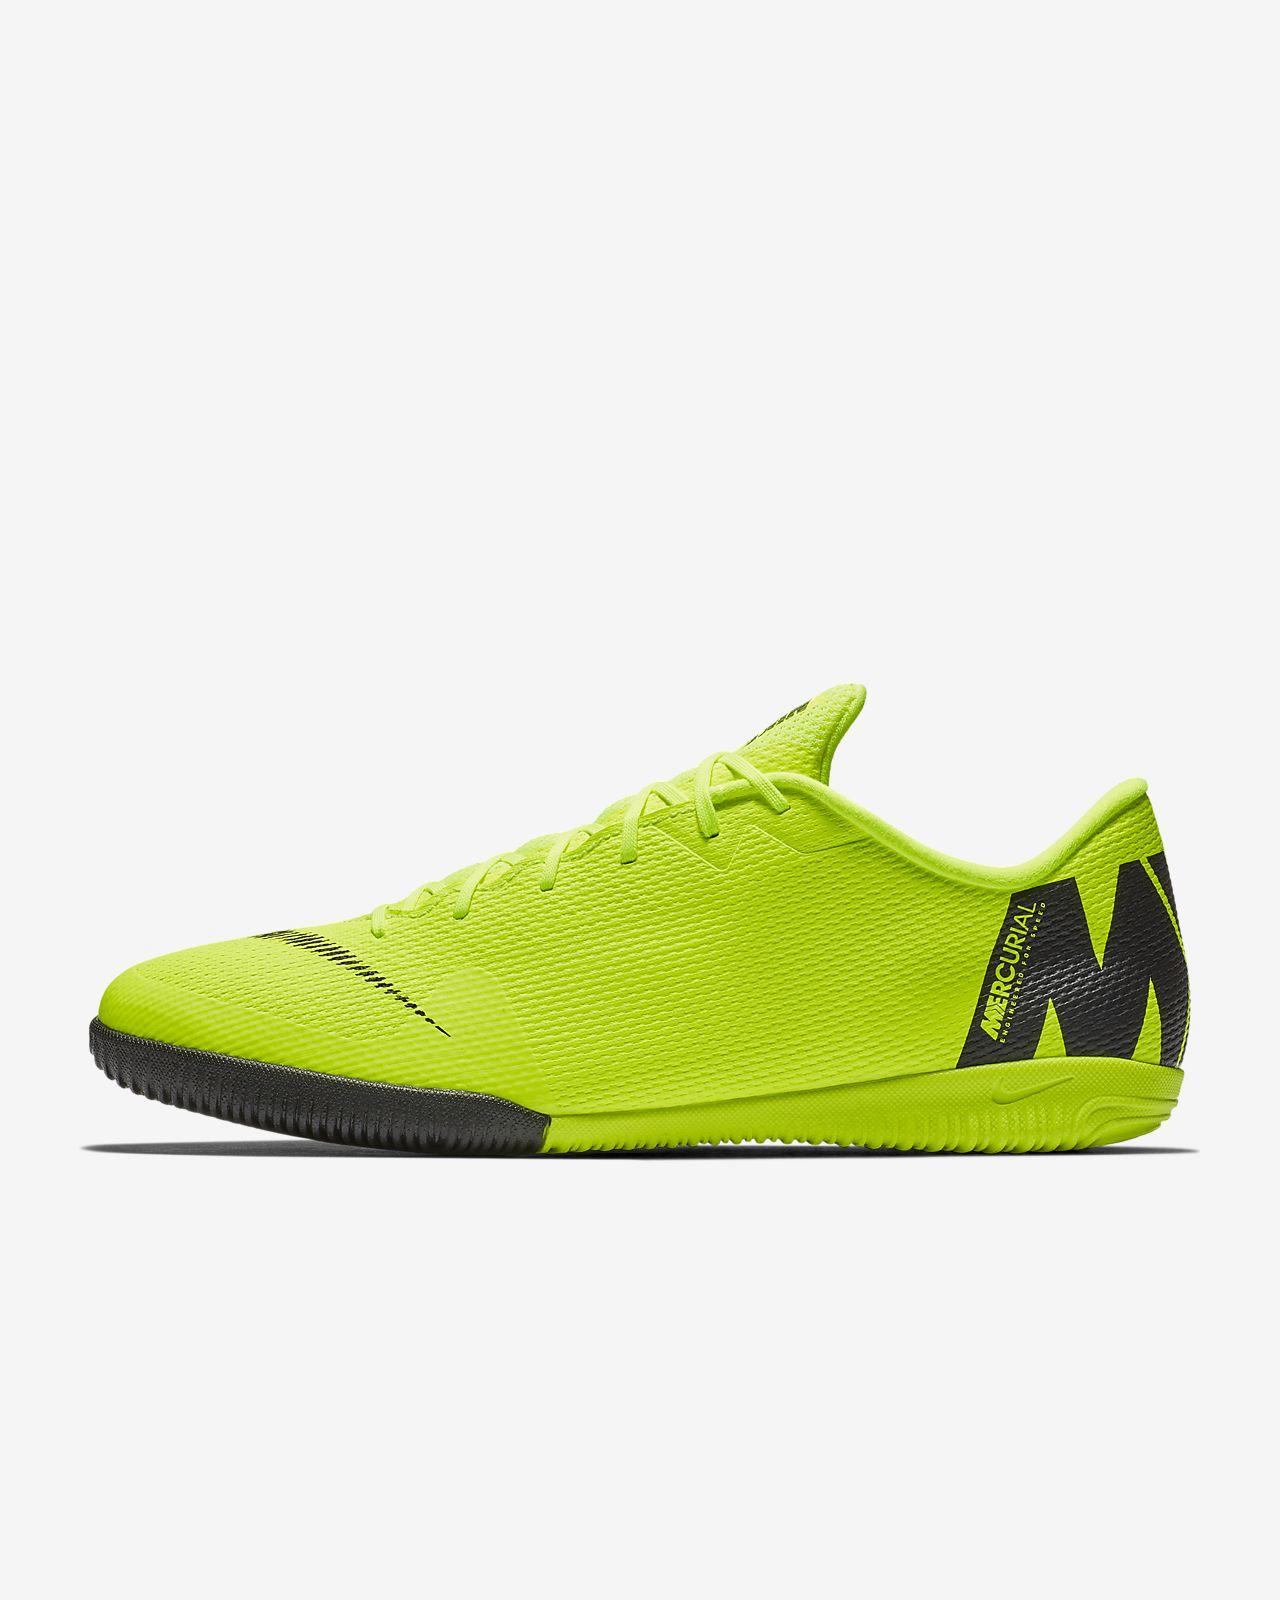 official photos bafd4 0b65f Nike VaporX 12 Academy IC Indoor/Court Football Shoe